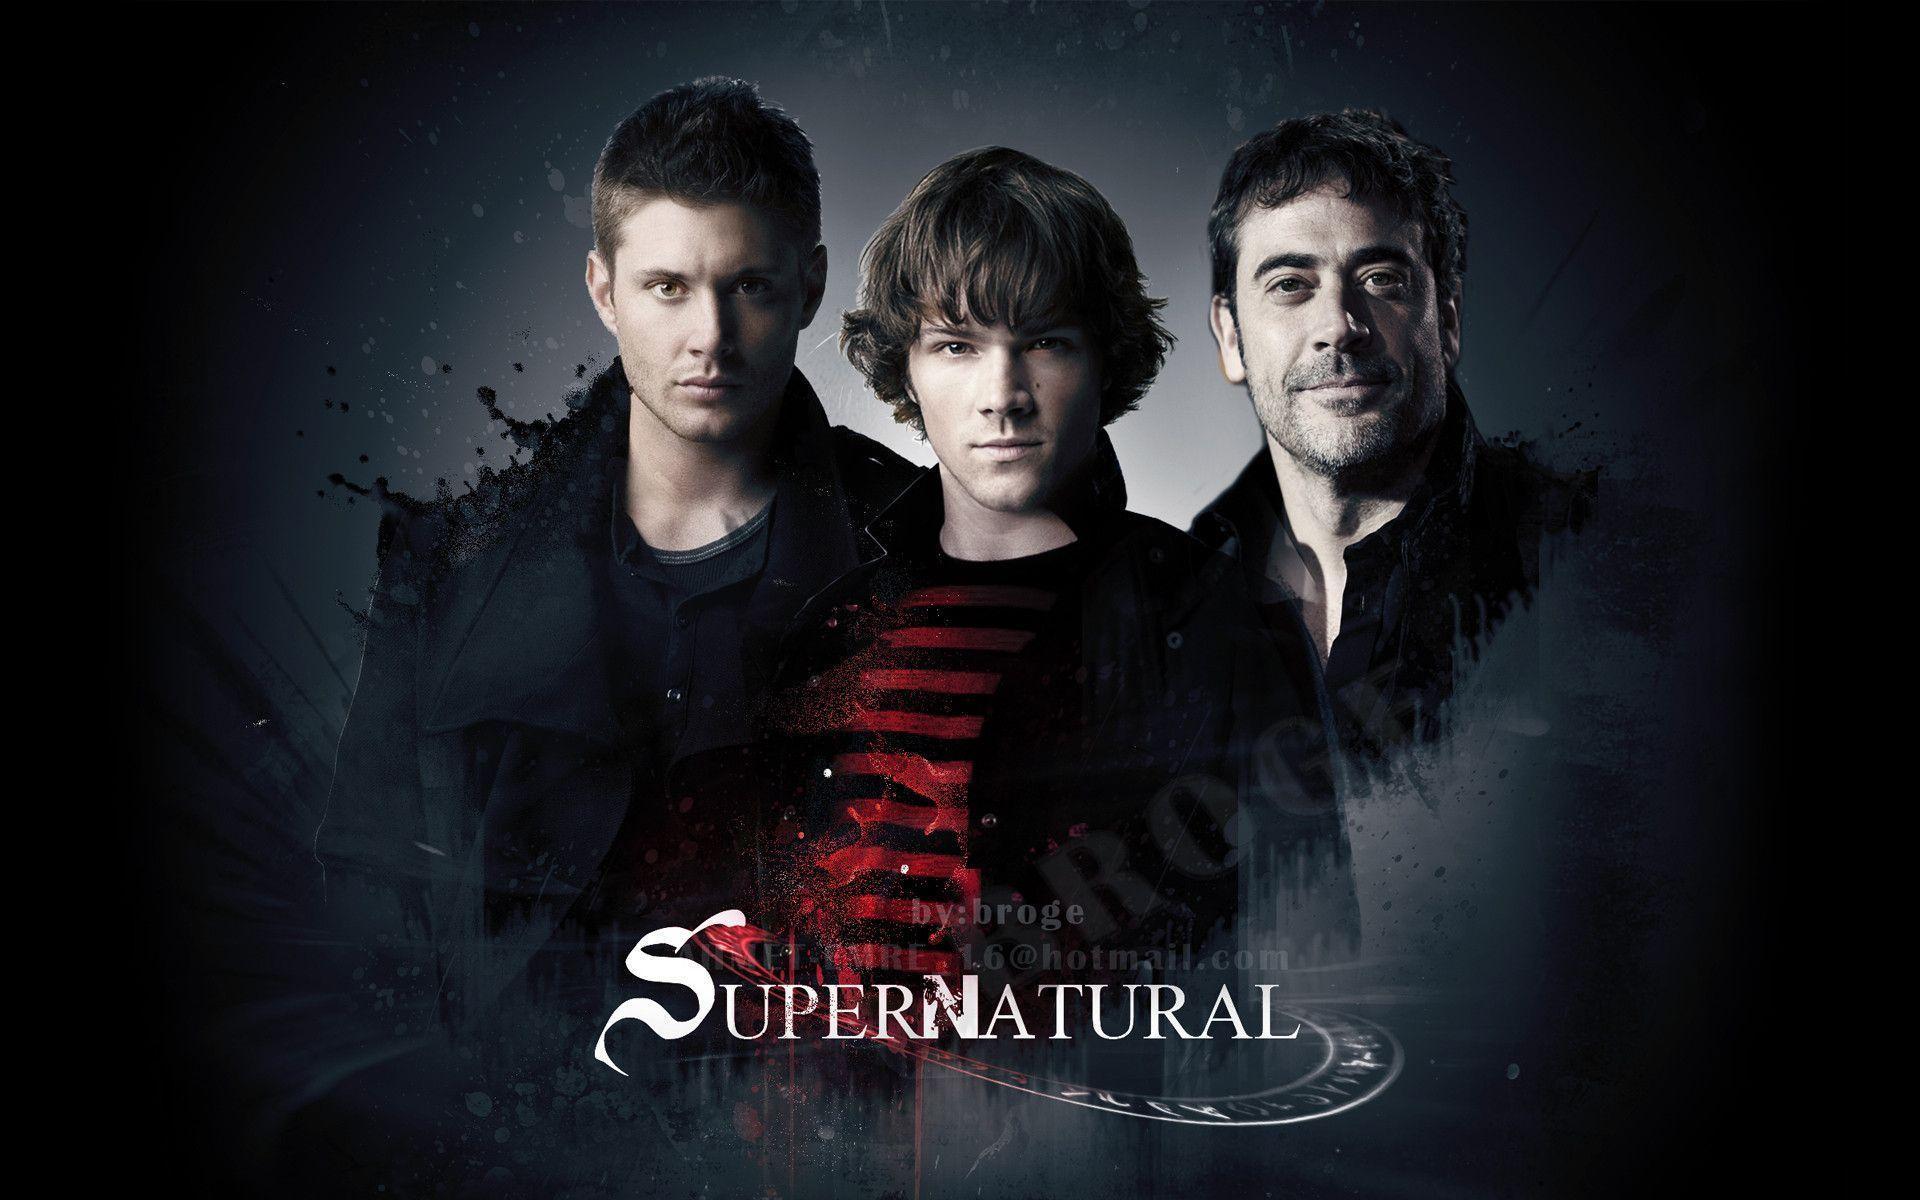 supernatural - Supernatural Wallpaper (15631115) - Fanpop